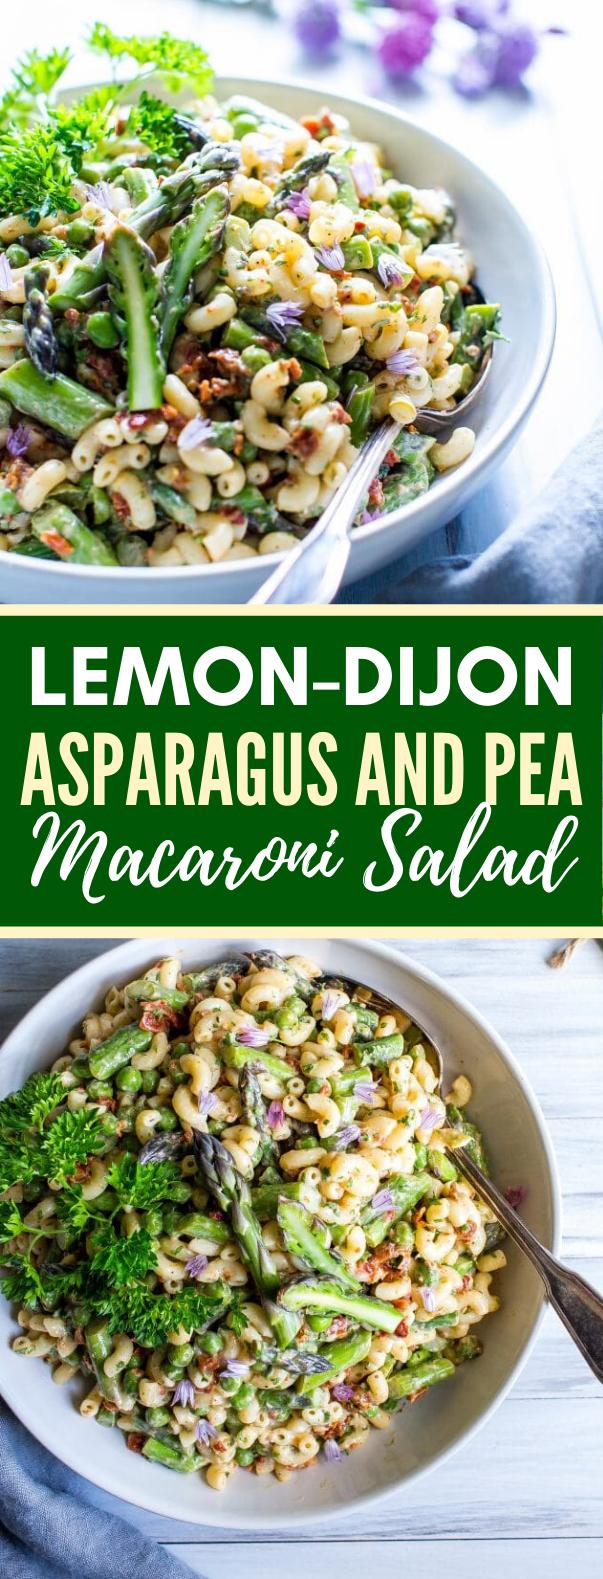 LEMON-DIJON ASPARAGUS AND PEA MACARONI SALAD #vegetarian #diet